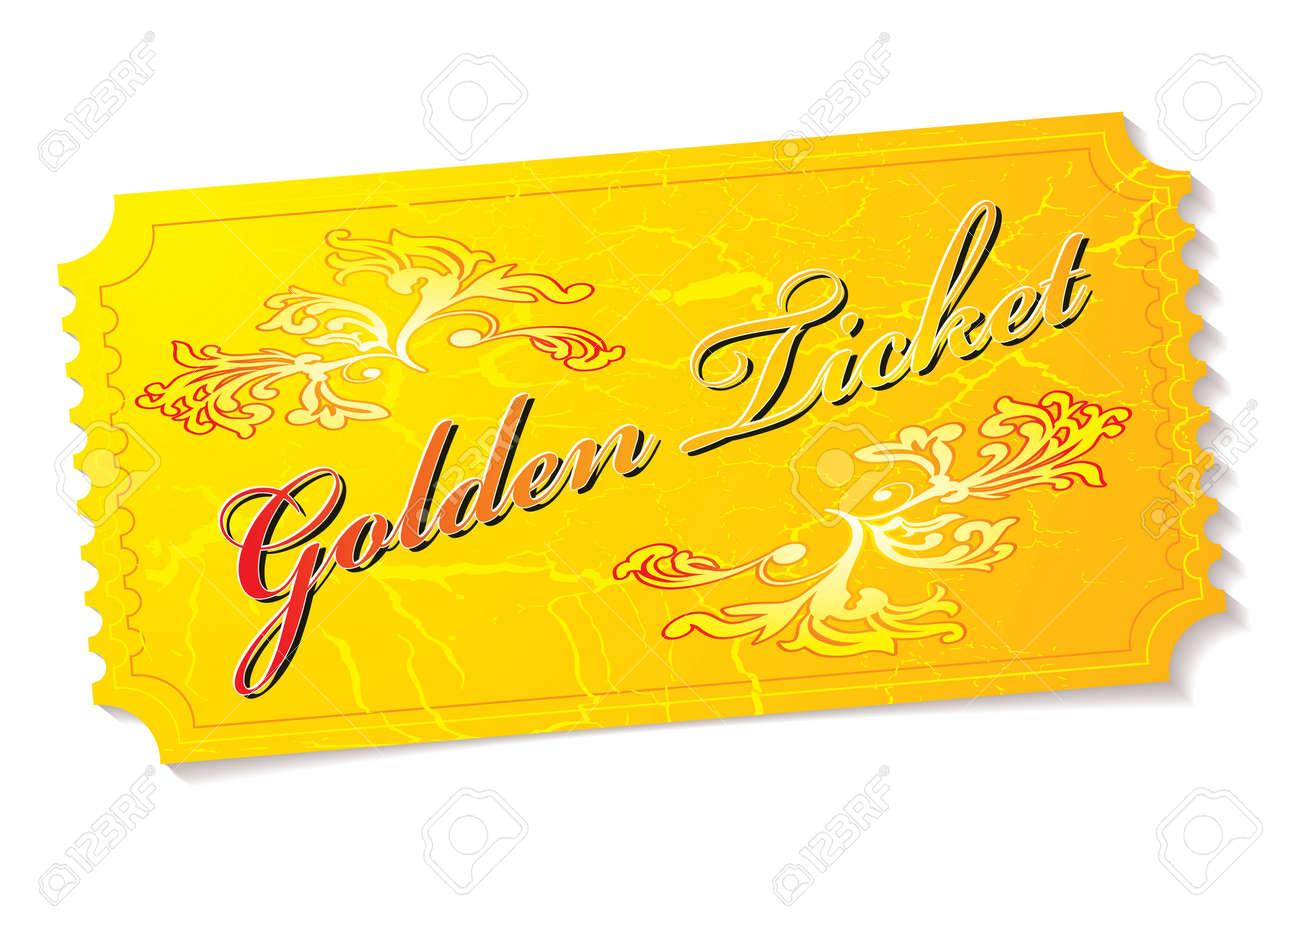 Golden winning prize ticket illustration with floral elements - 7331393